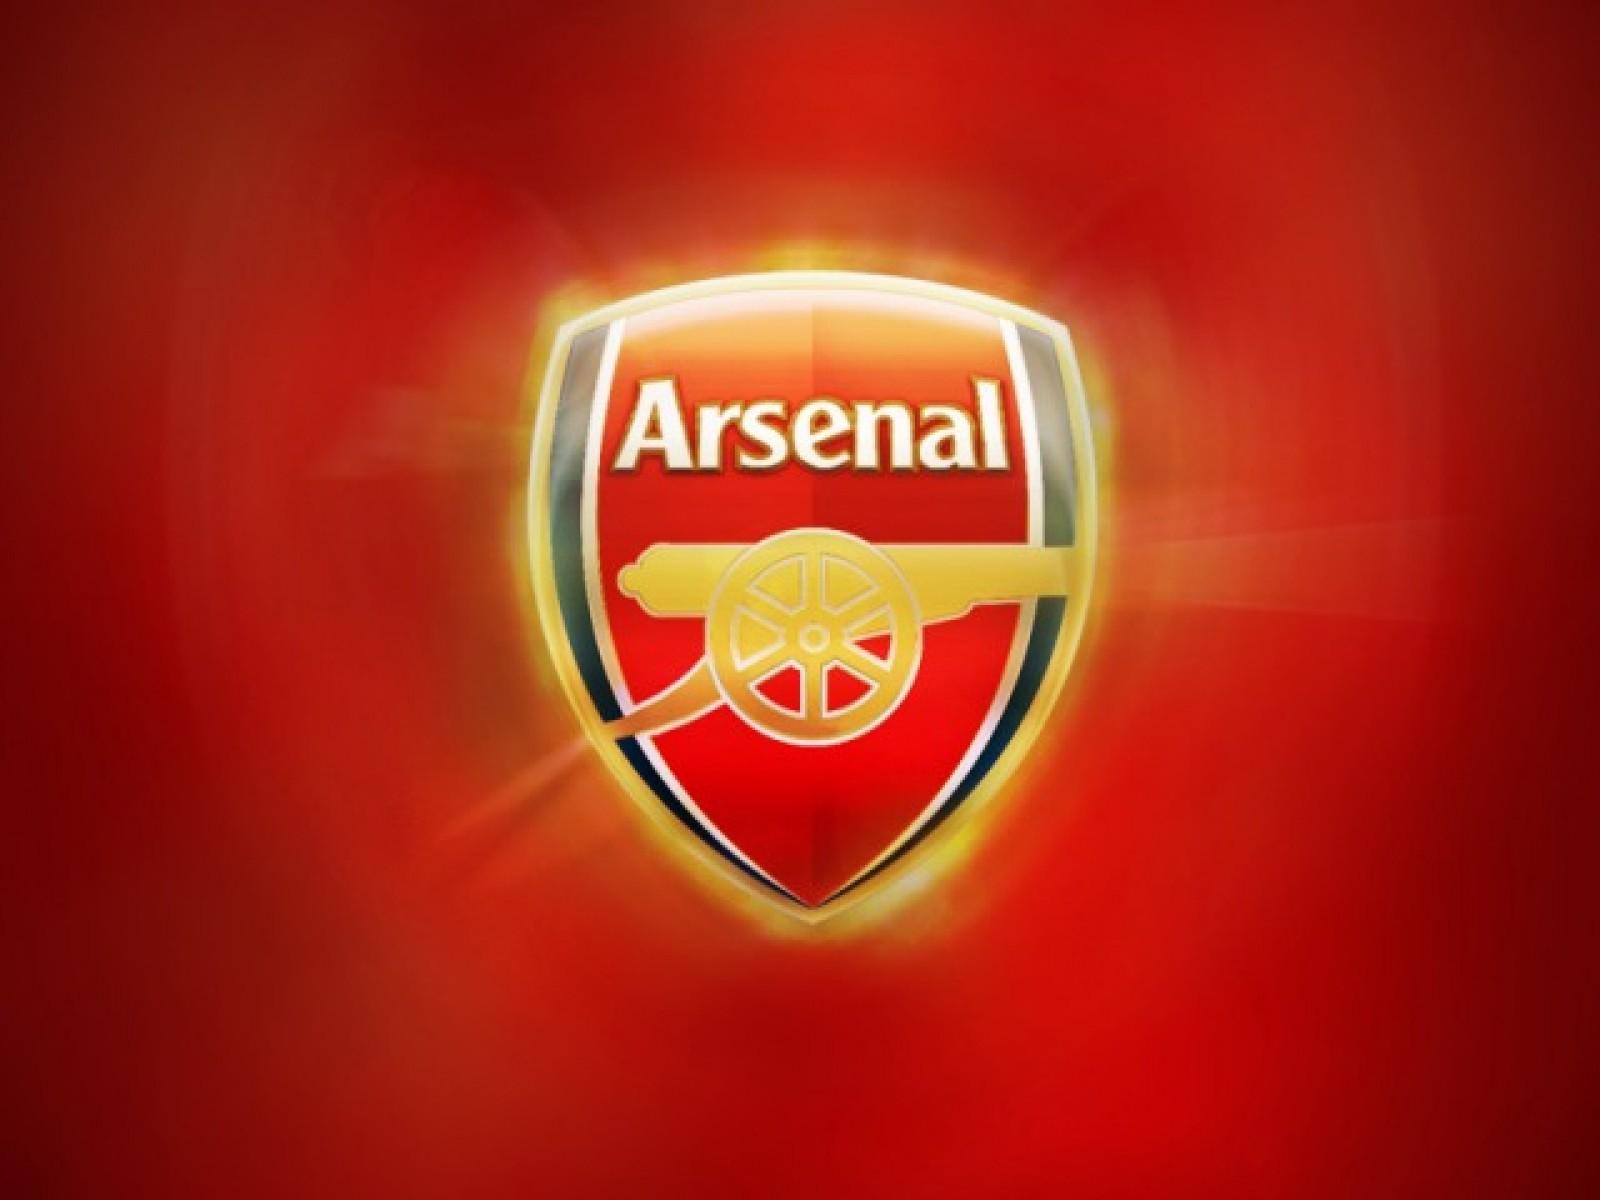 arsenal logo hd wallpapers Desktop Backgrounds for HD 1600x1200